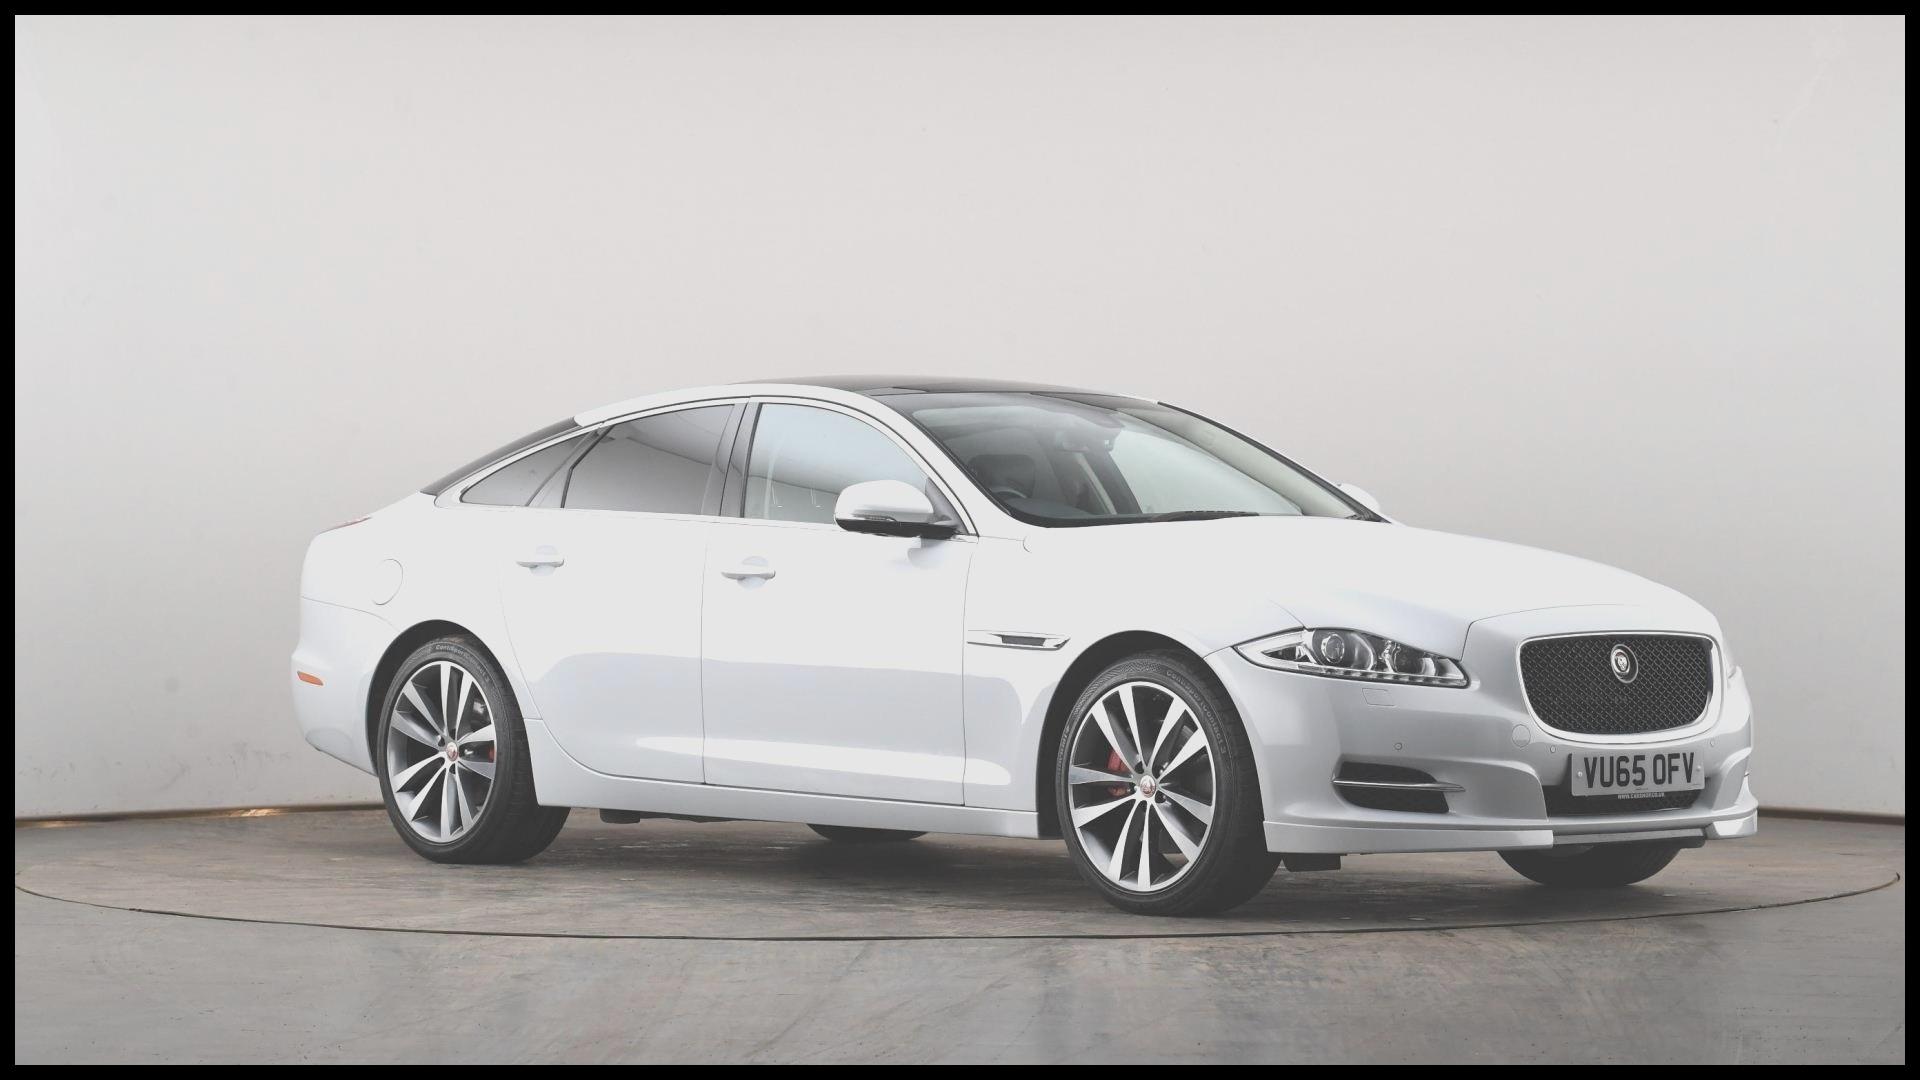 S3 Pricing Unique 17 Luxury Audi Rs3 Usa Image